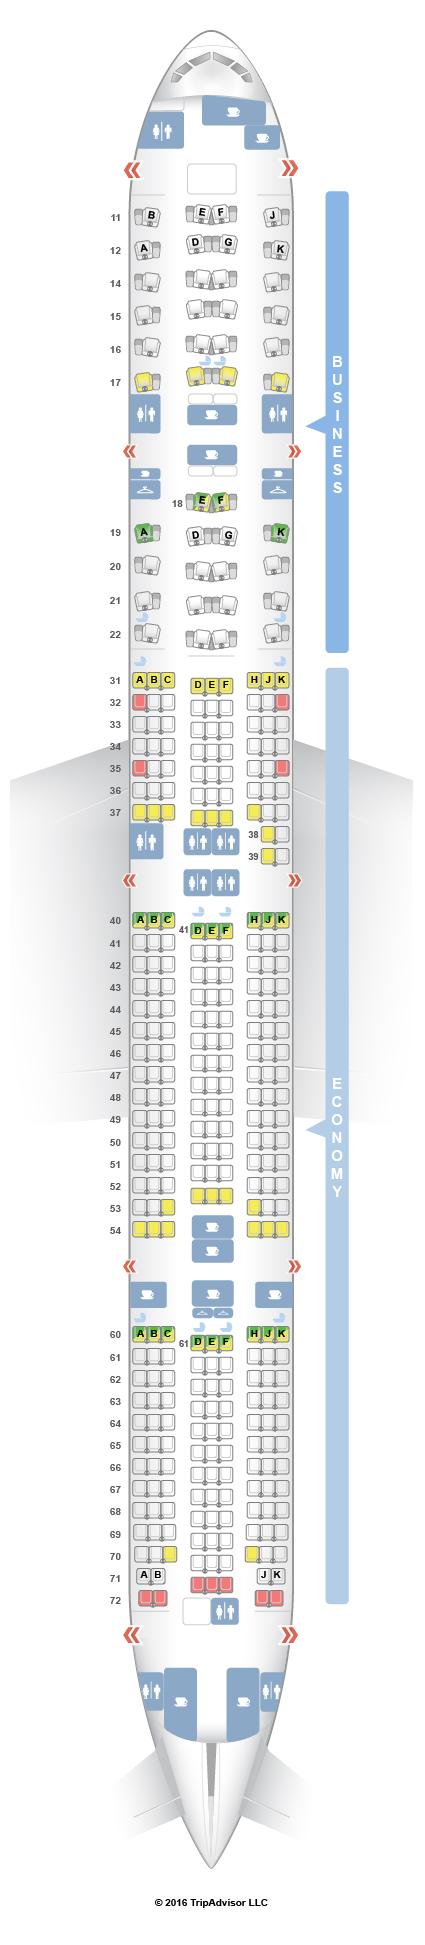 Seating Plan Boeing 777 300er Qatar | Brokeasshome.com